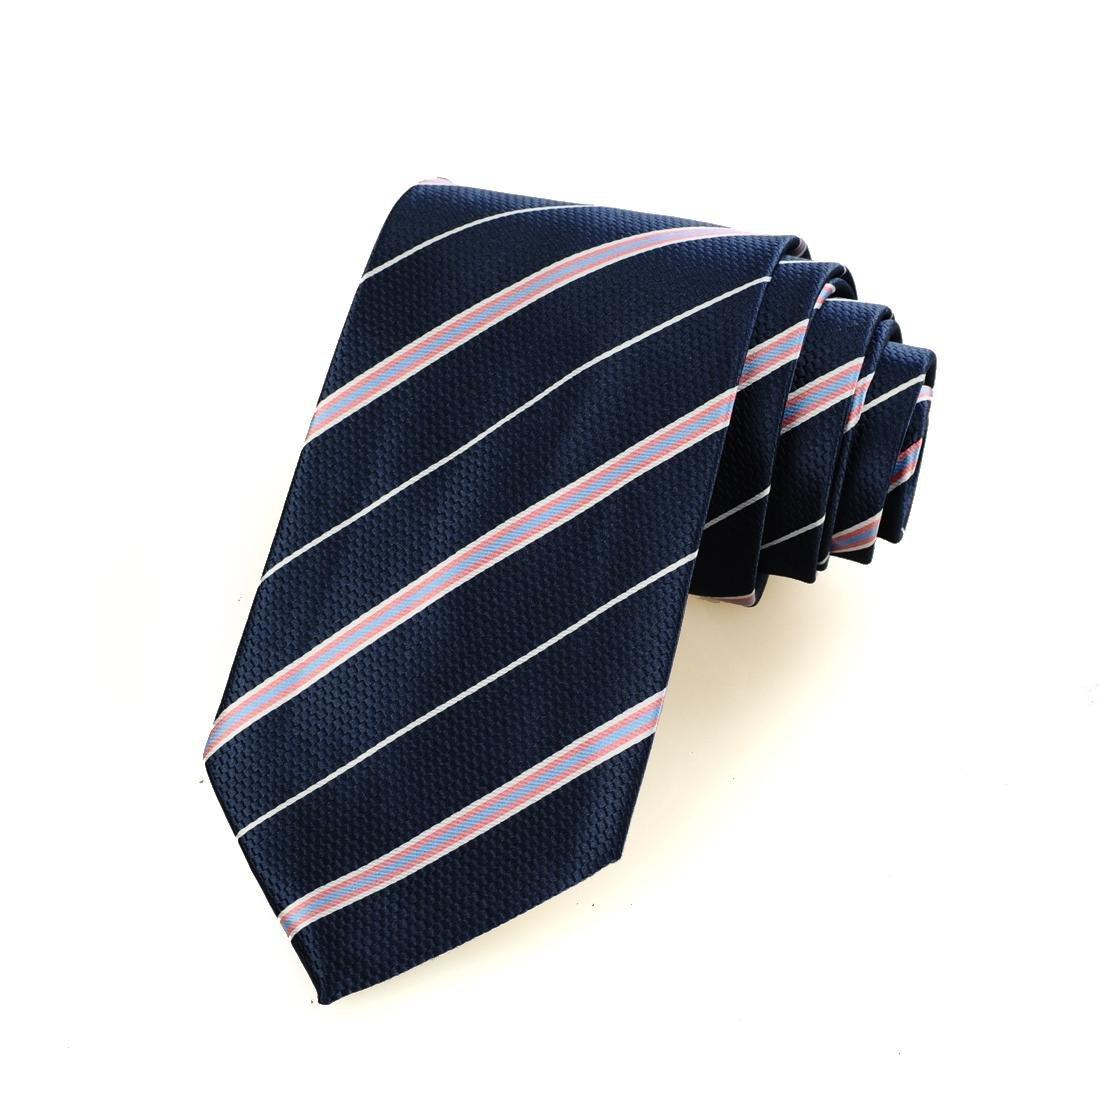 FYios/®Rosa Wei/ß gestreift Marine Blau Herren Krawatte Krawatte Gesch/äftsreise Geschenk #0009